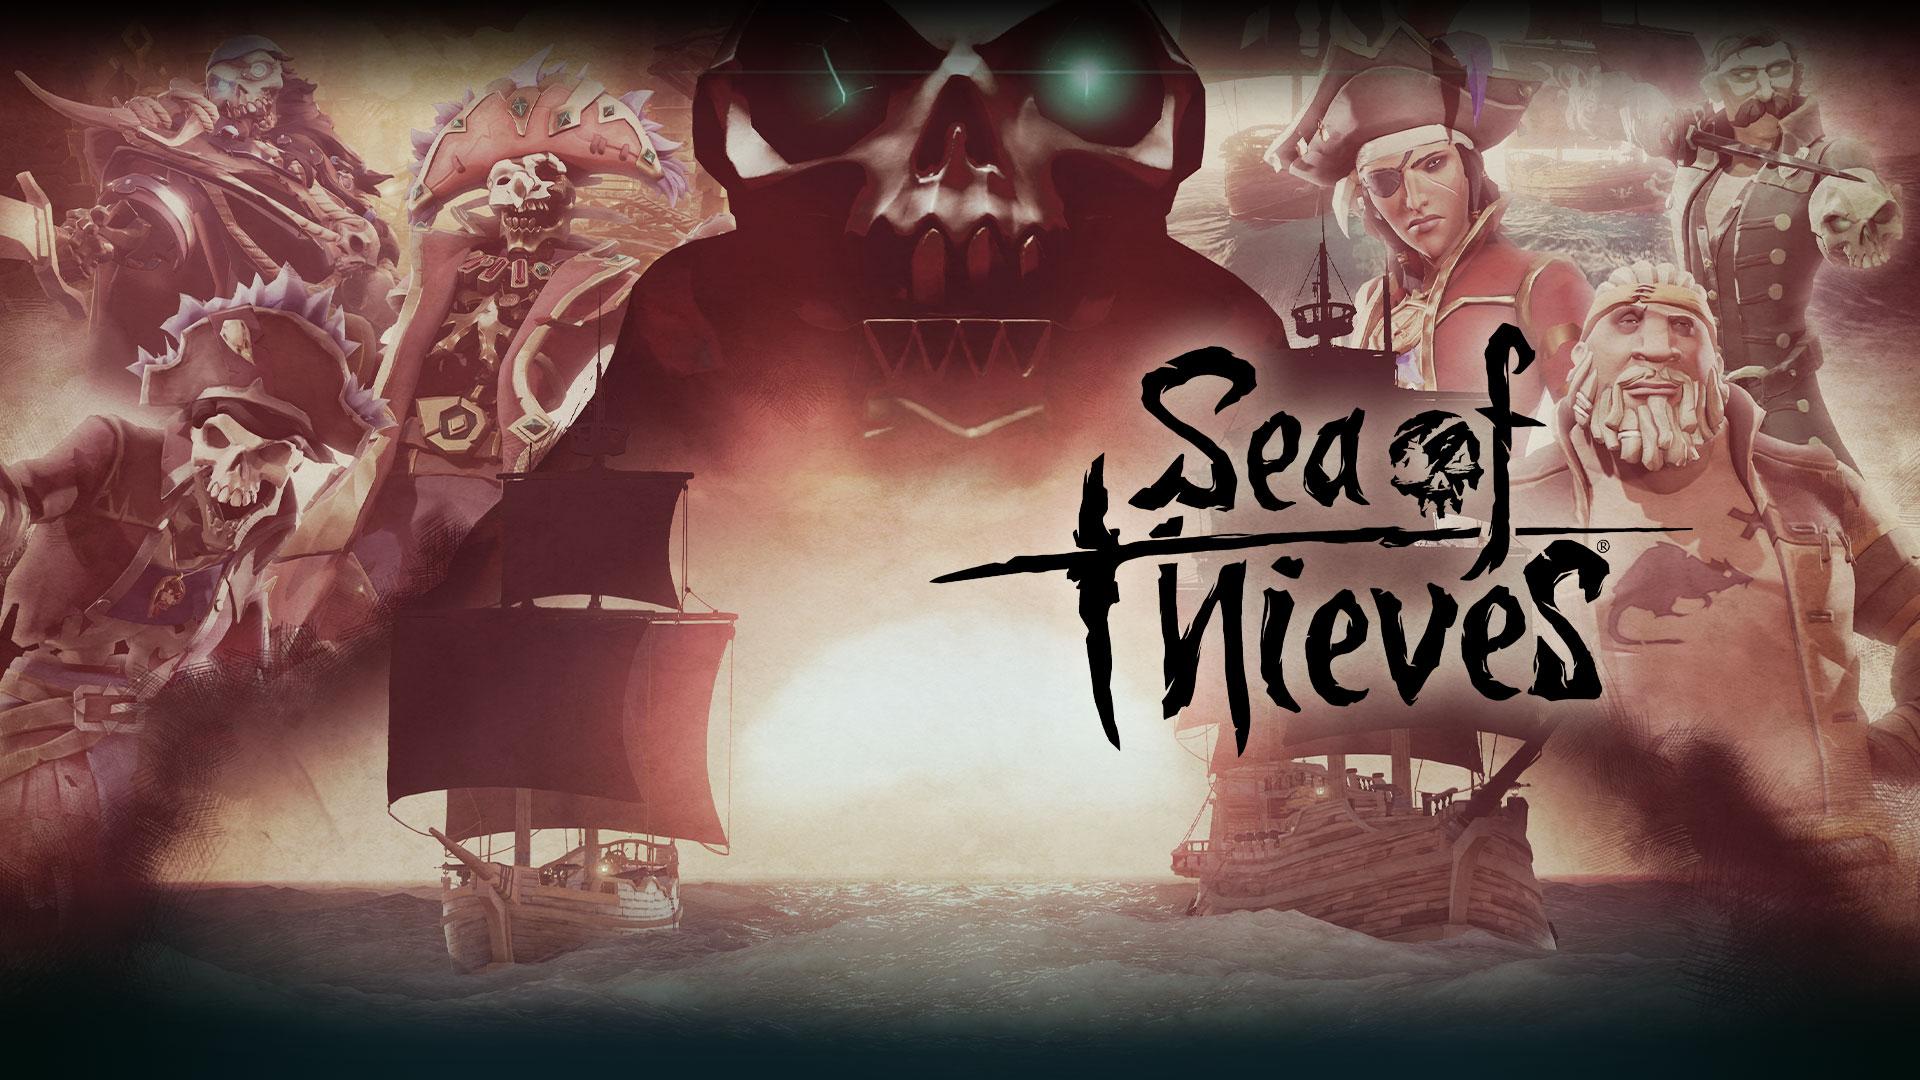 Sea of thieves para Microsoft Store (PC/XBOX)